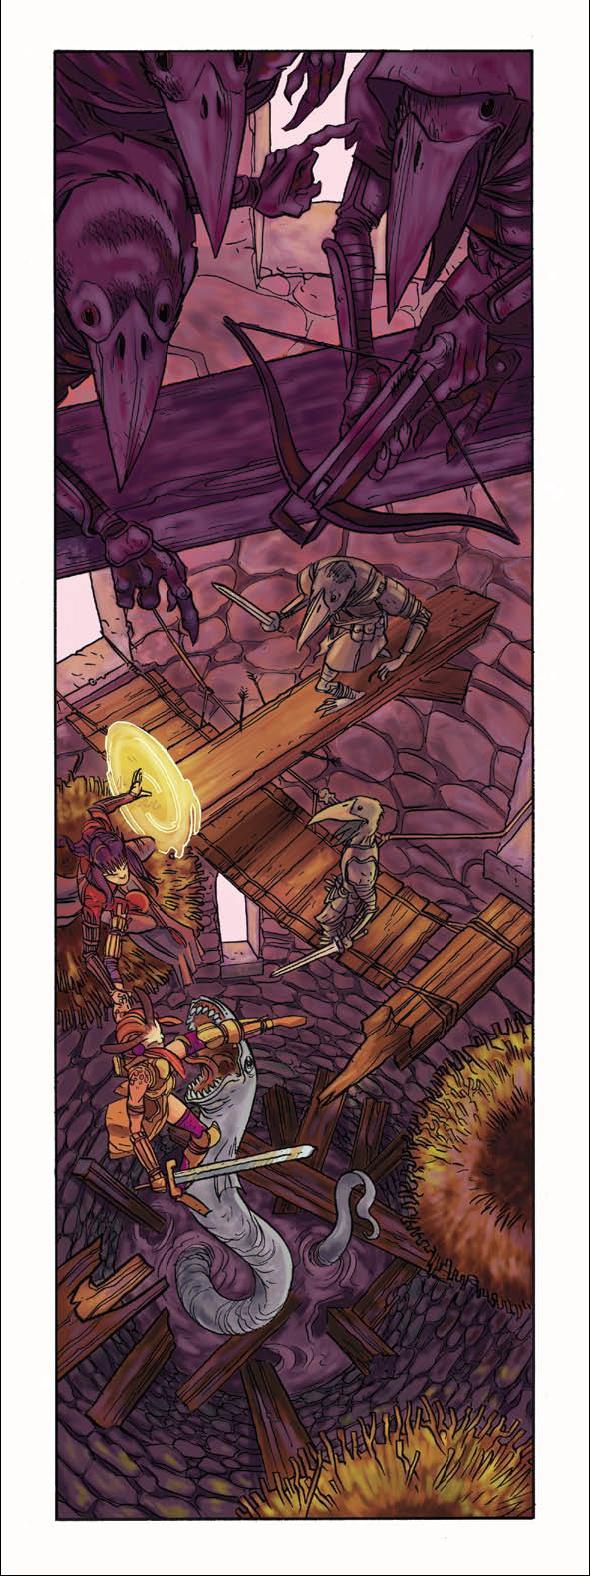 bilge eel Tiefling in una brutta situazione, tra kenku e anguille albine di sentina - by Ramòn Pérez Dungeon Magazine #138 (2006-09) © Wizards of the Coast & Hasbro